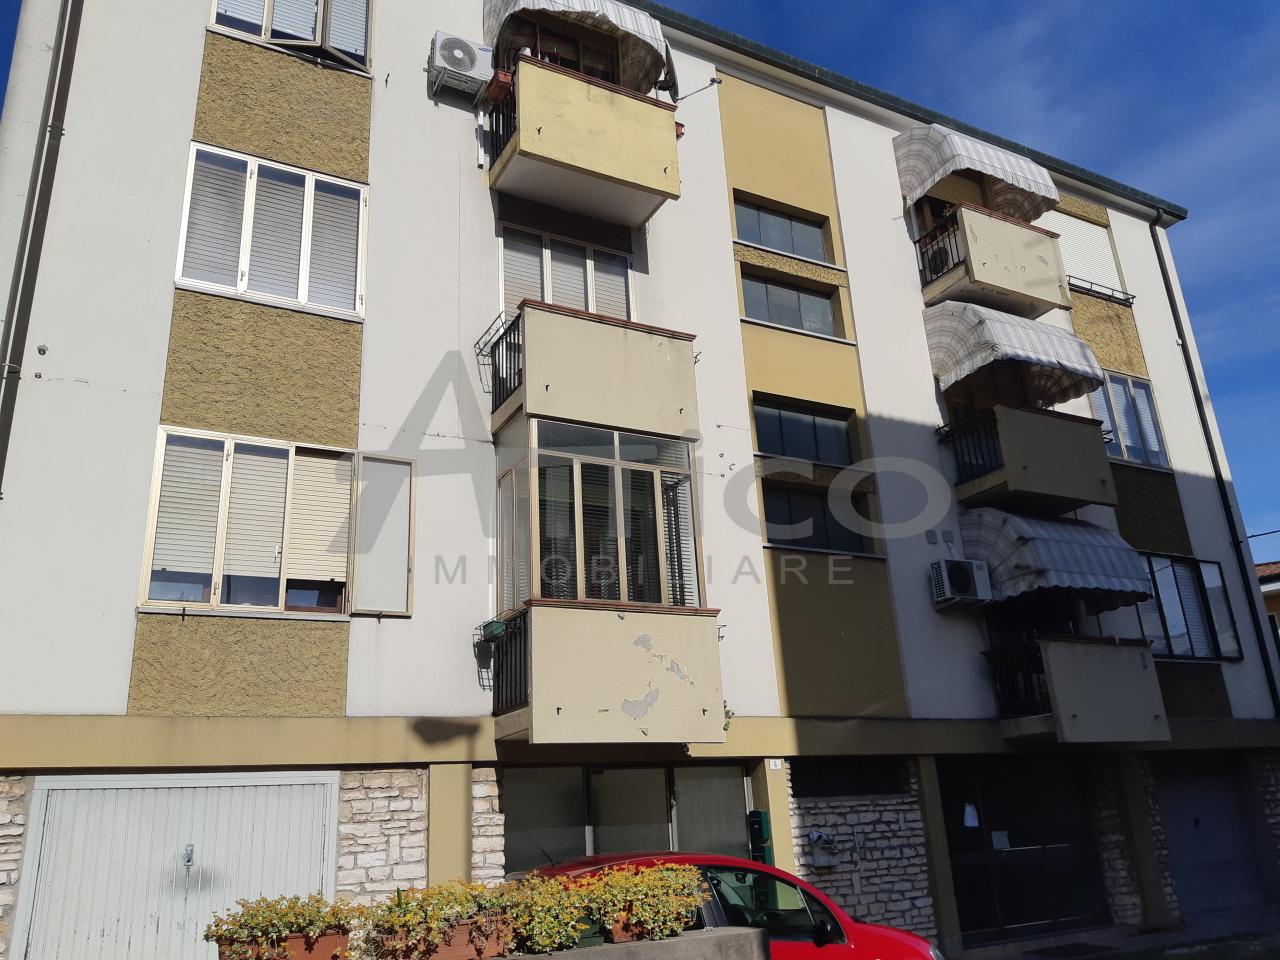 Appartamento - Pentalocale a S. Bortolo, Rovigo